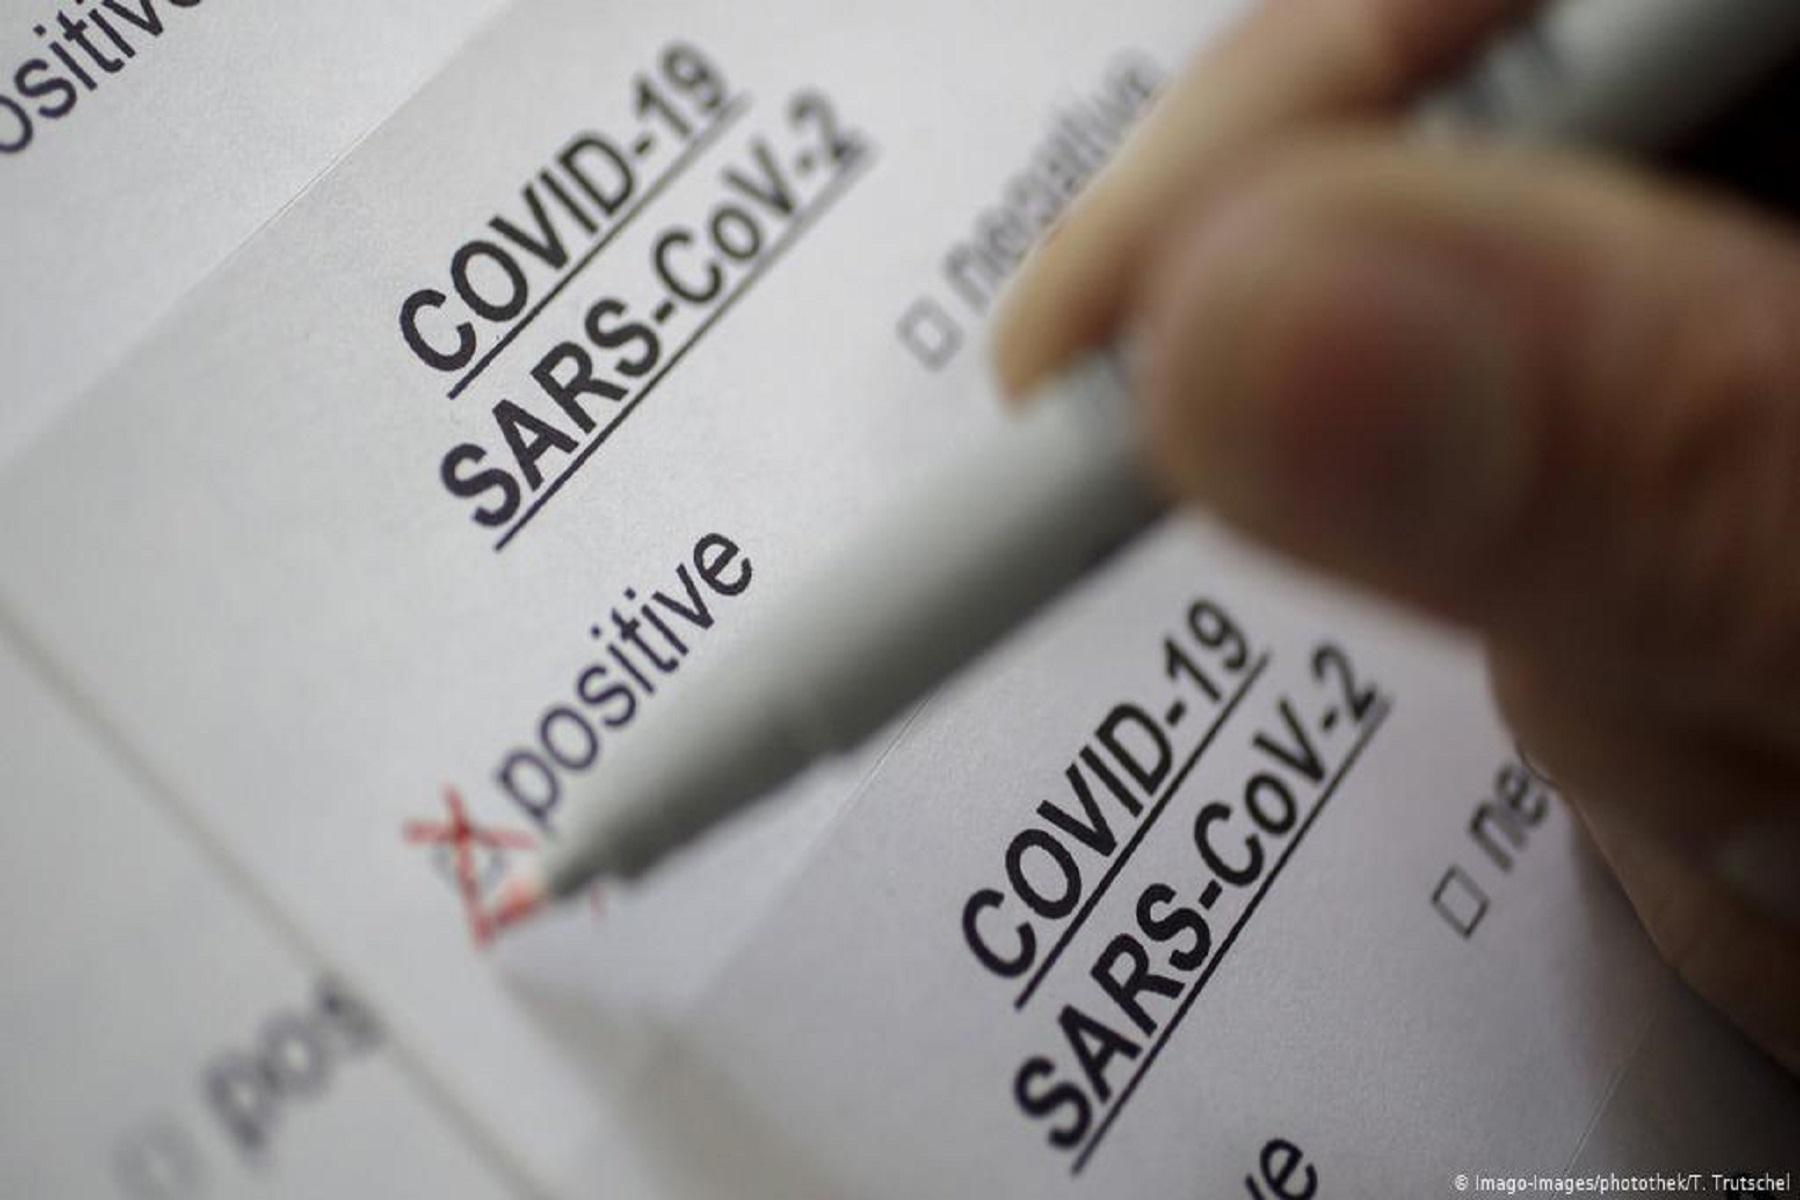 Europol Προειδοποίηση: Πωλούνται αρνητικά τεστ κορωνοϊού σε αεροδρόμια της Ευρώπης